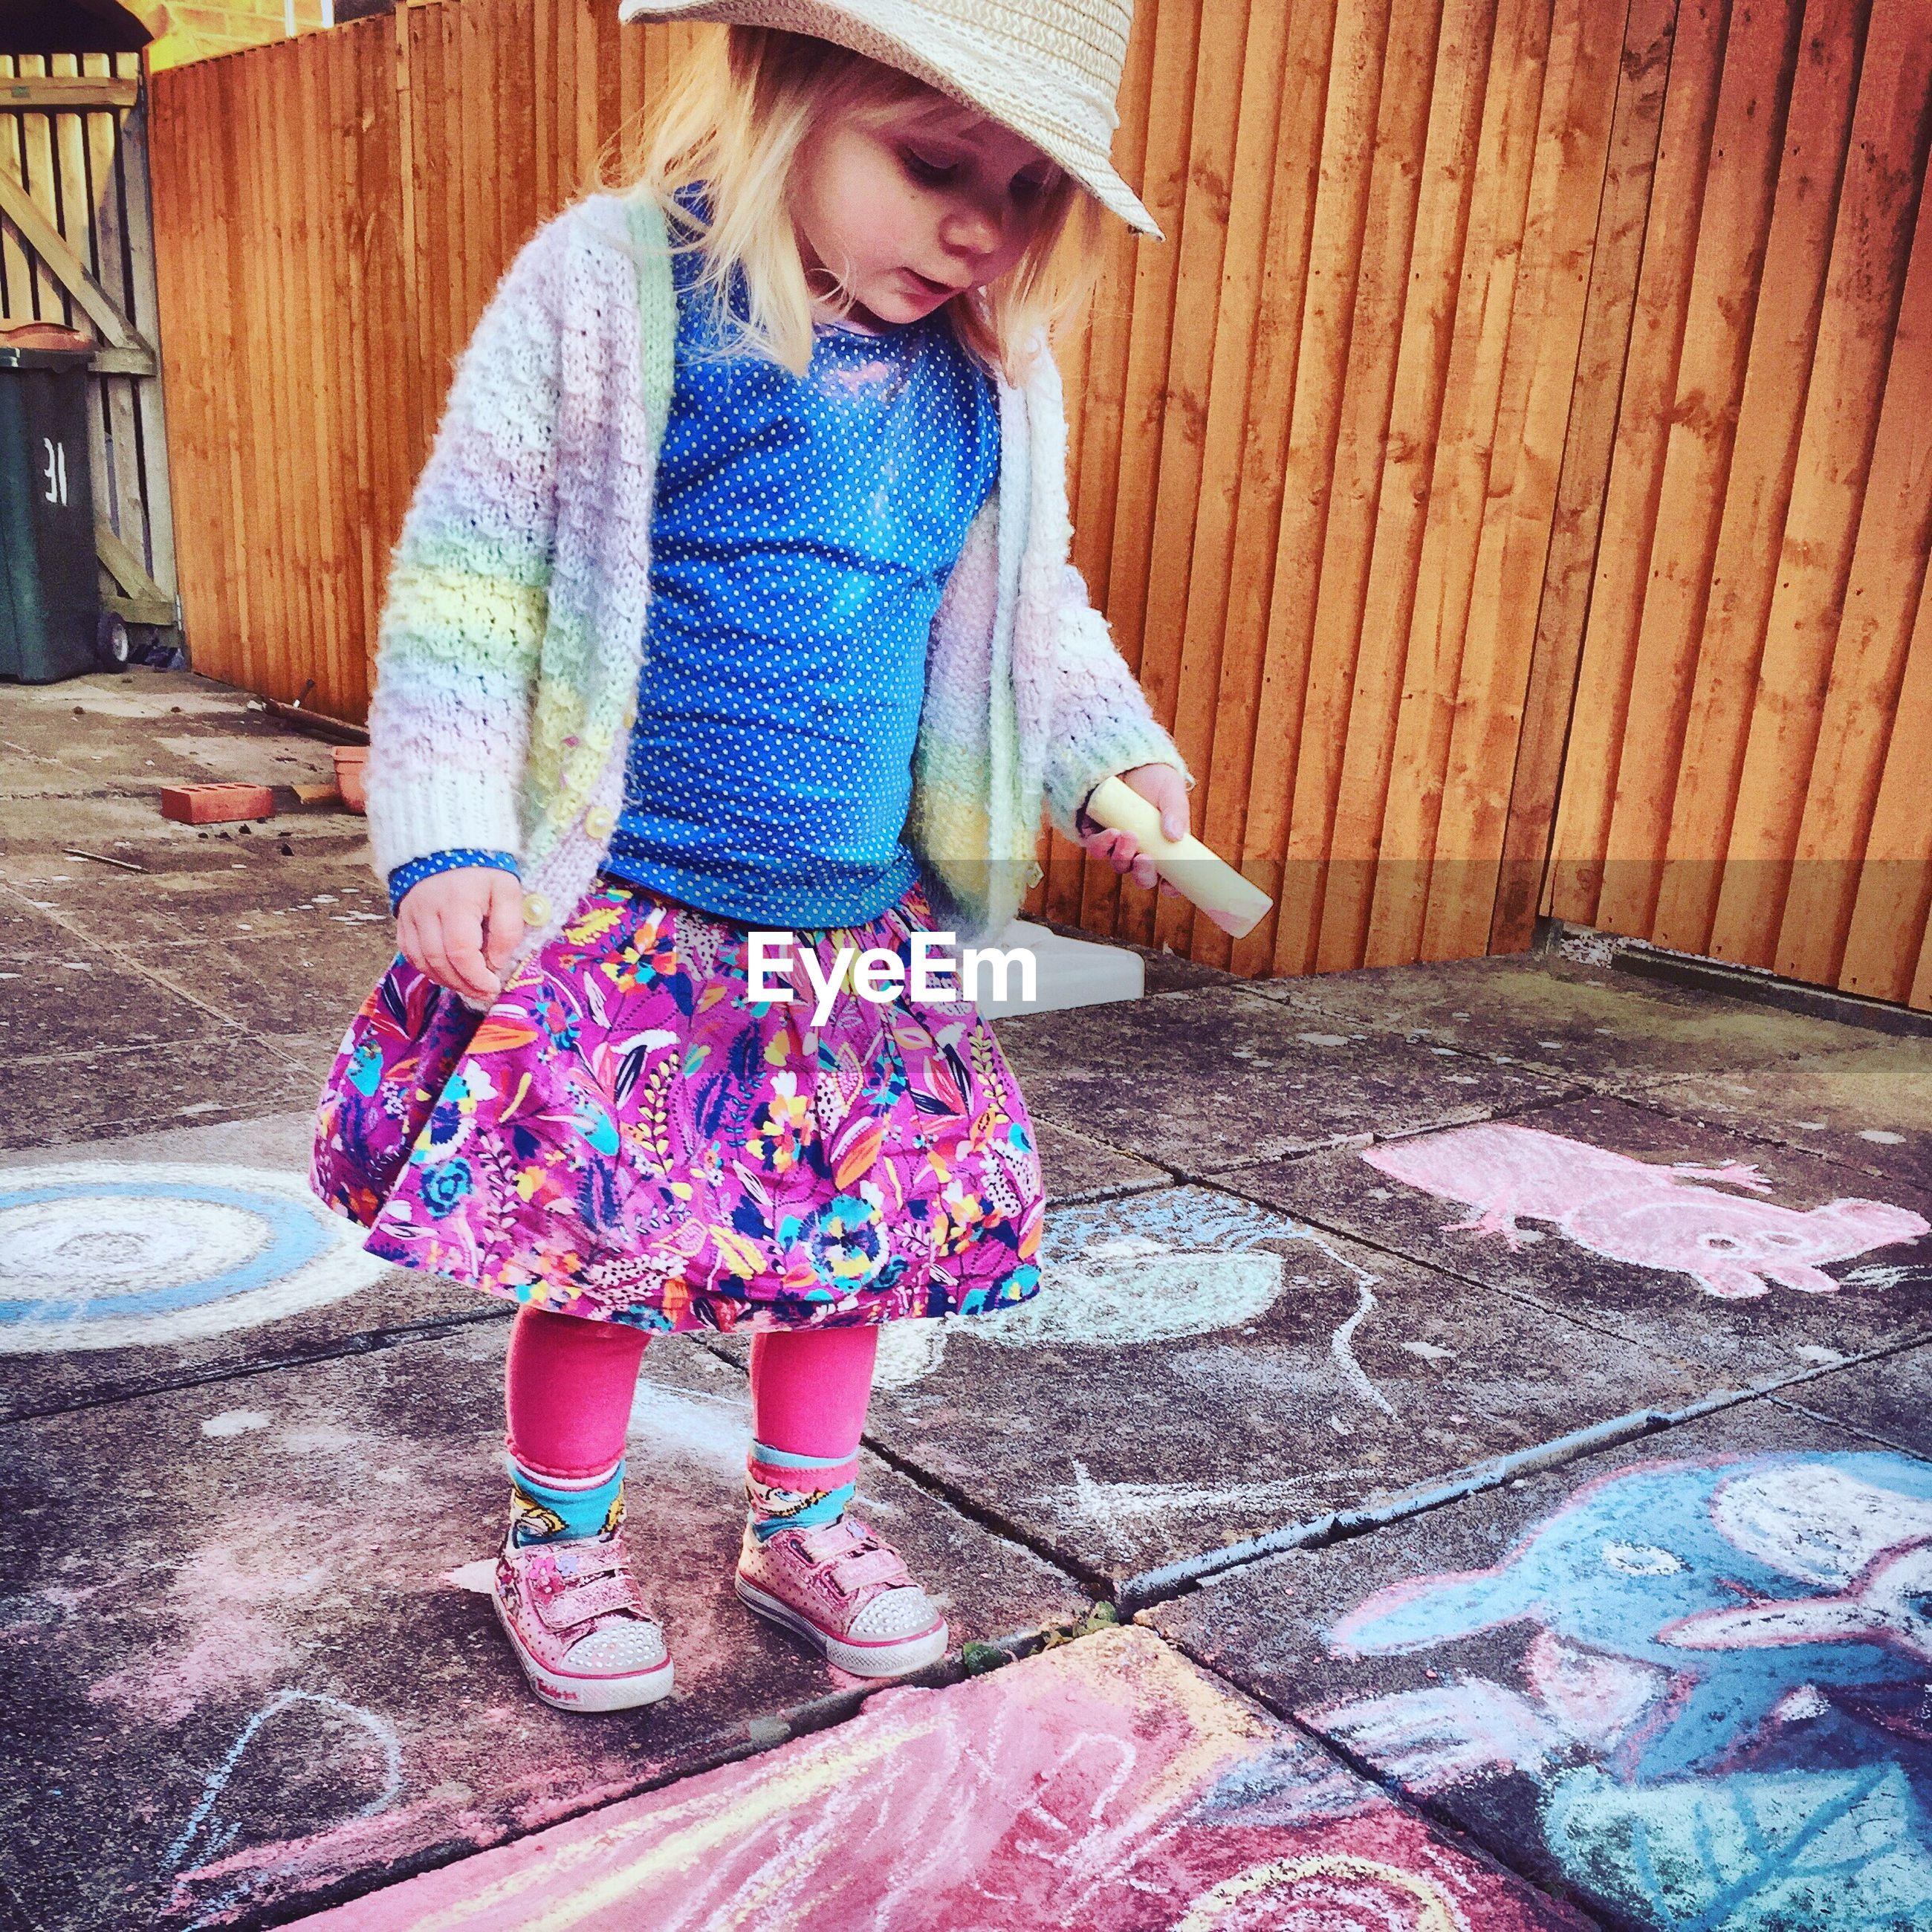 Cute girl doing chalk drawing on sidewalk